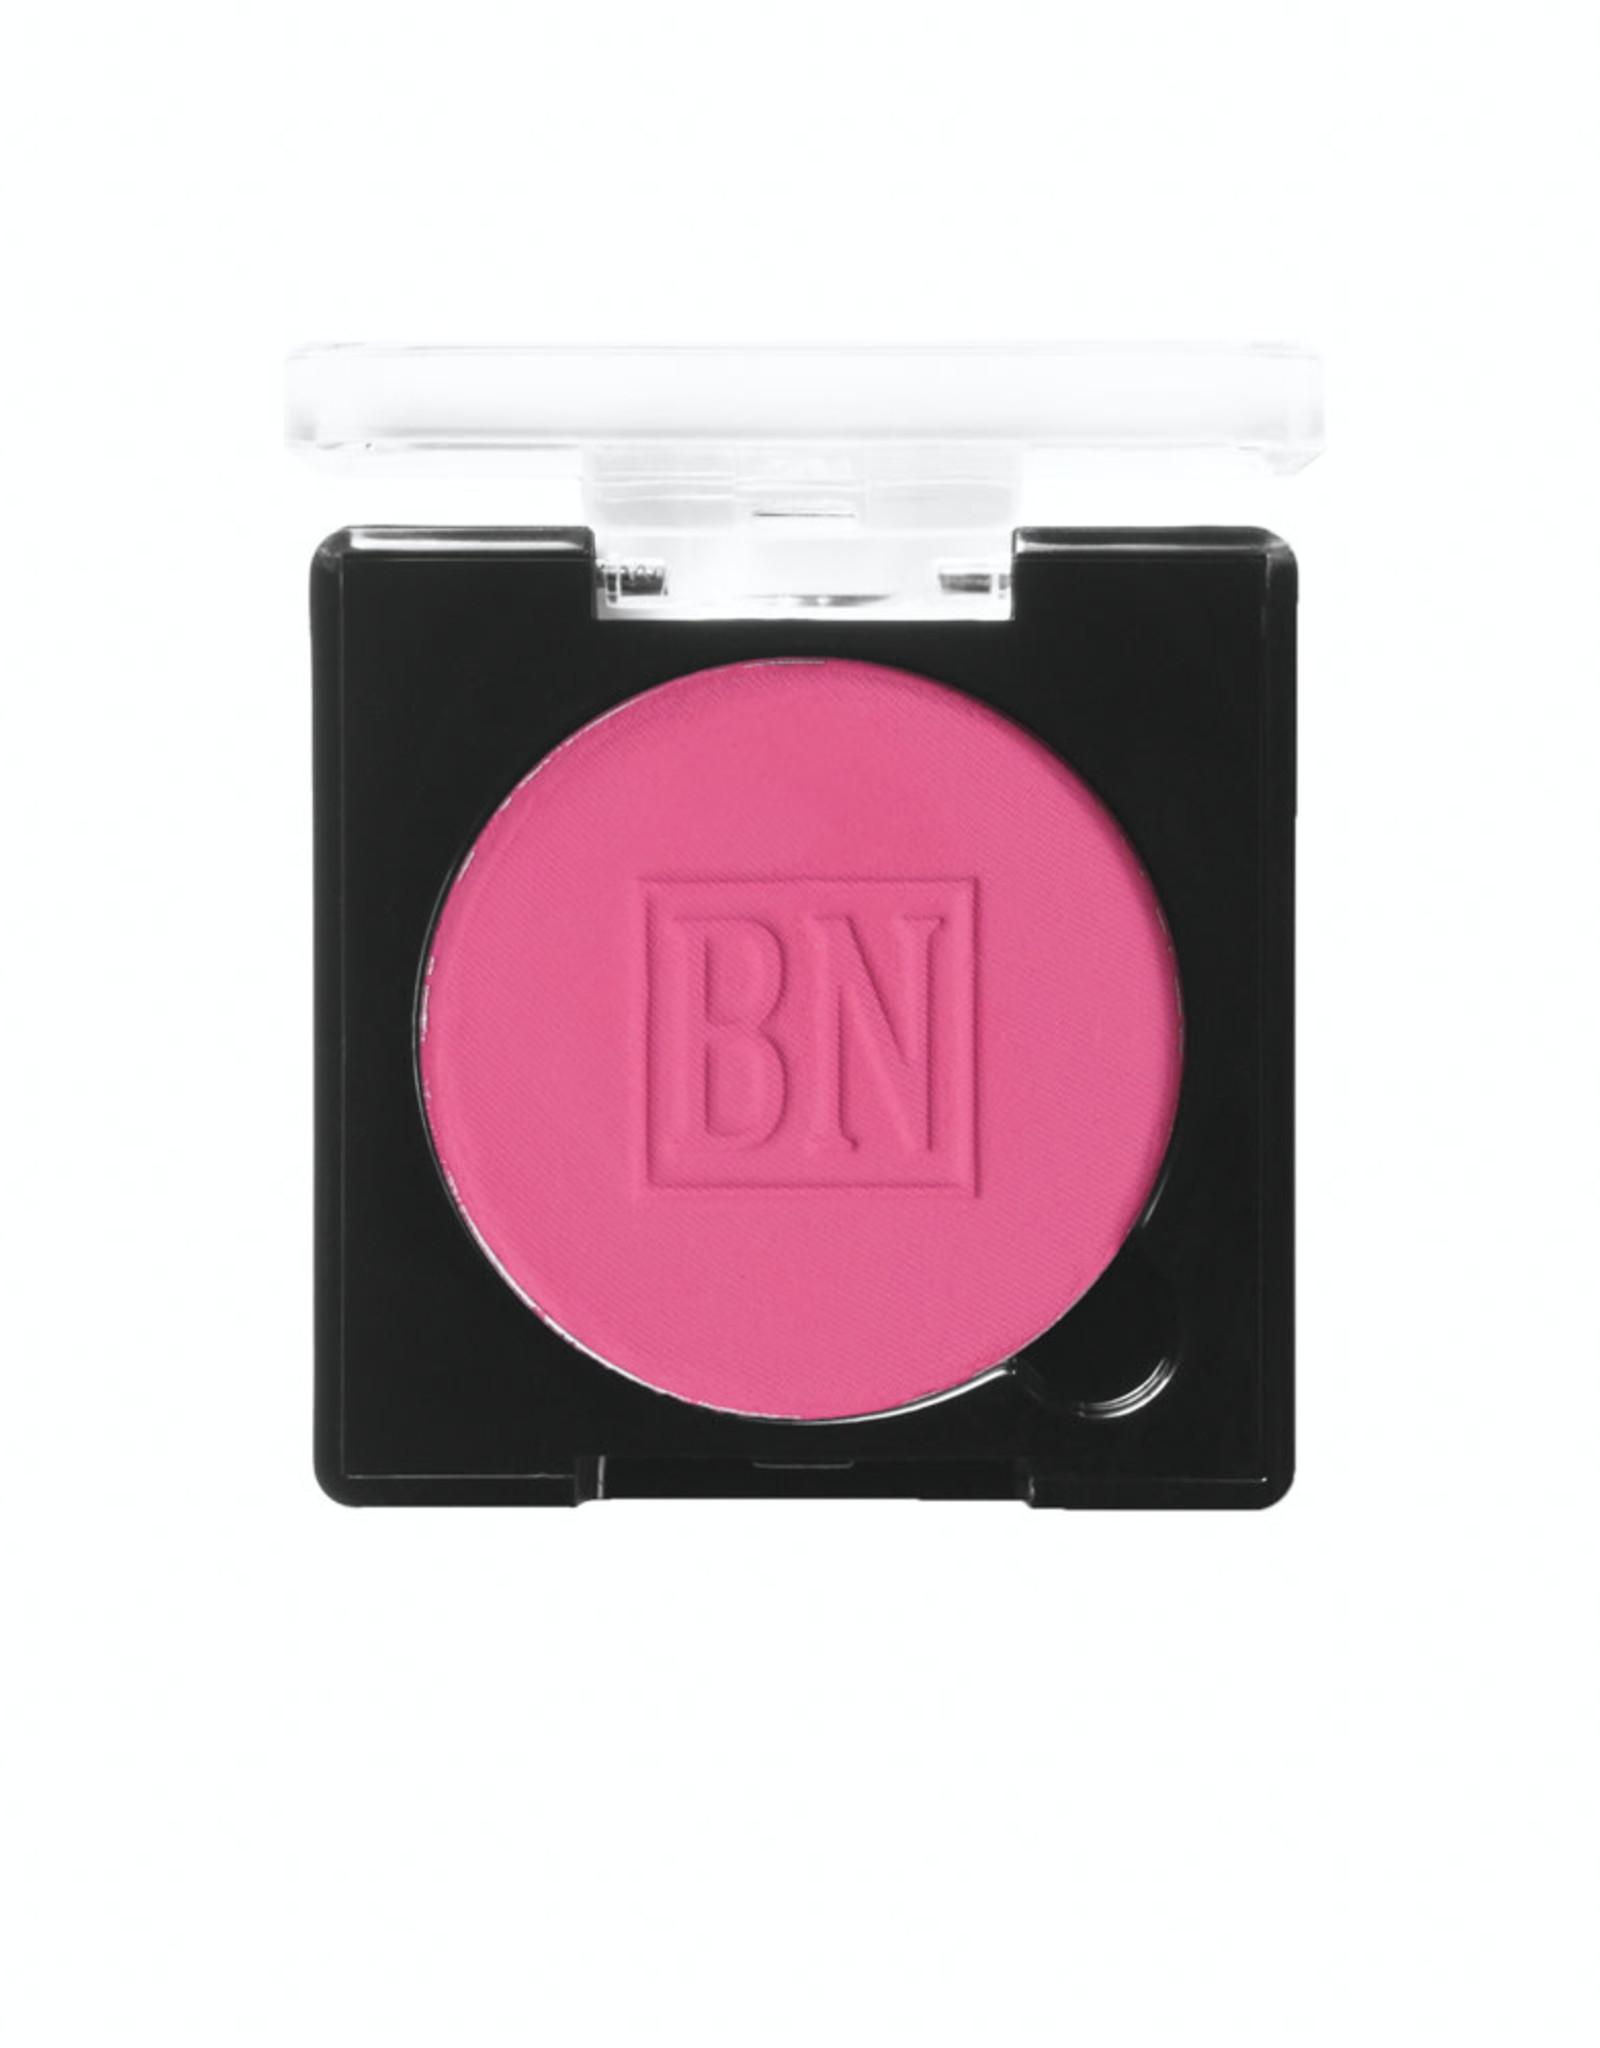 Ben Nye ROUGE-POWDER, MISTY PINK,  .12 OZ